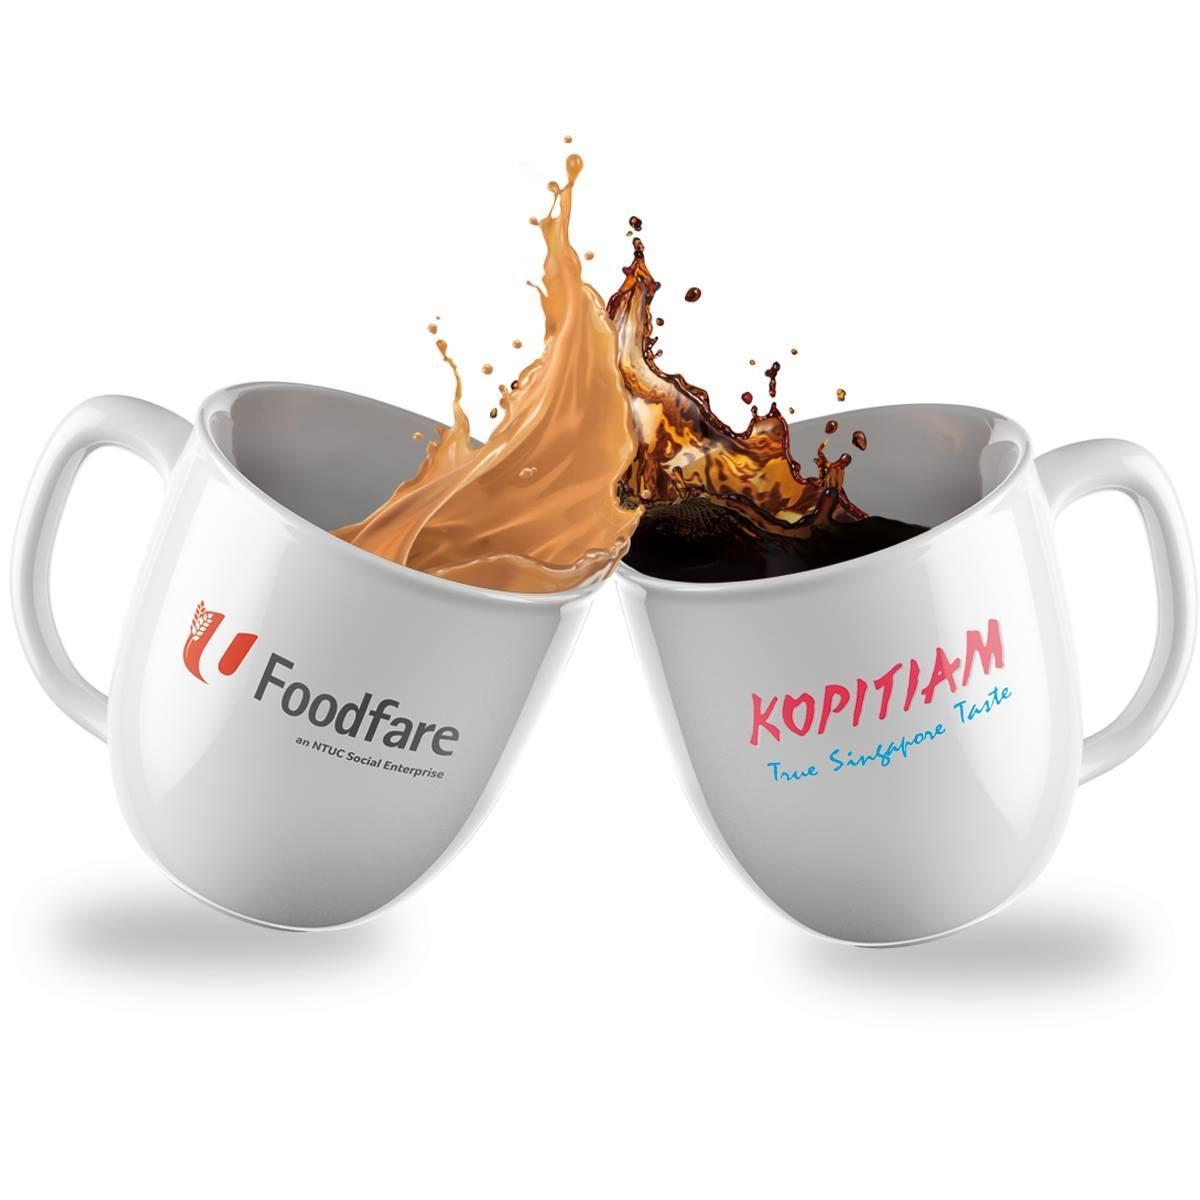 kopitiam foodfare logo